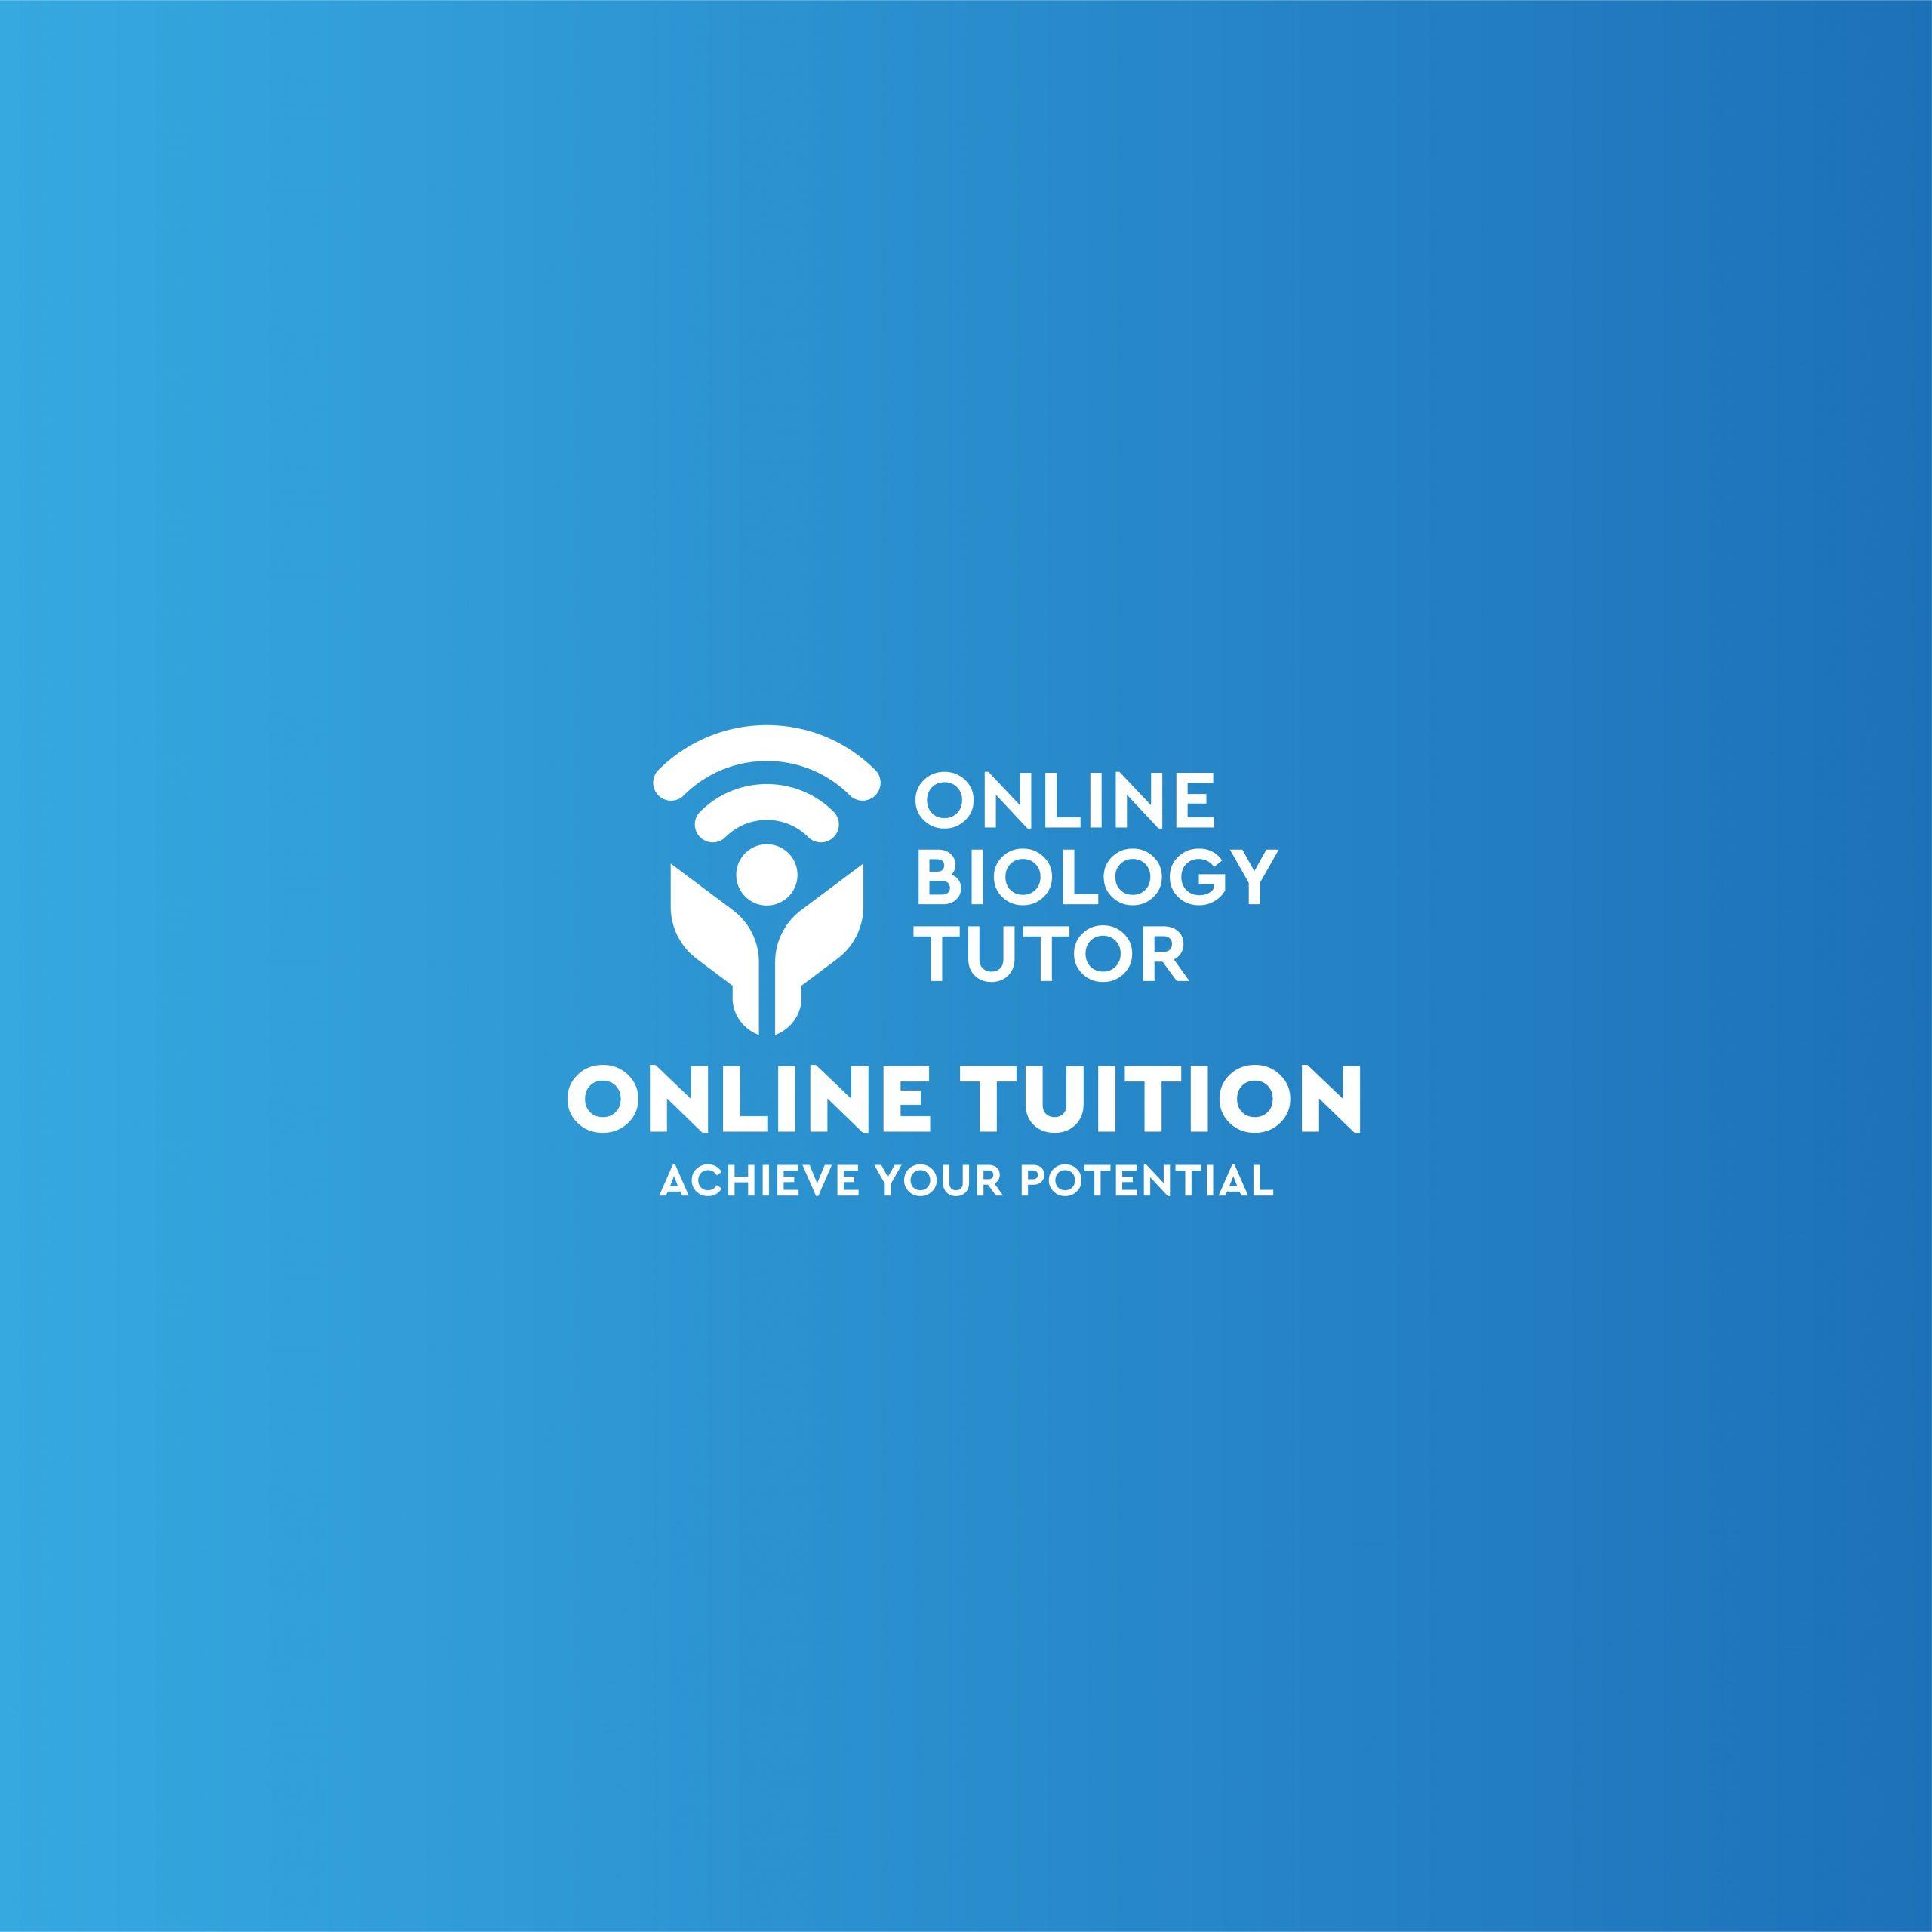 online biology tutor